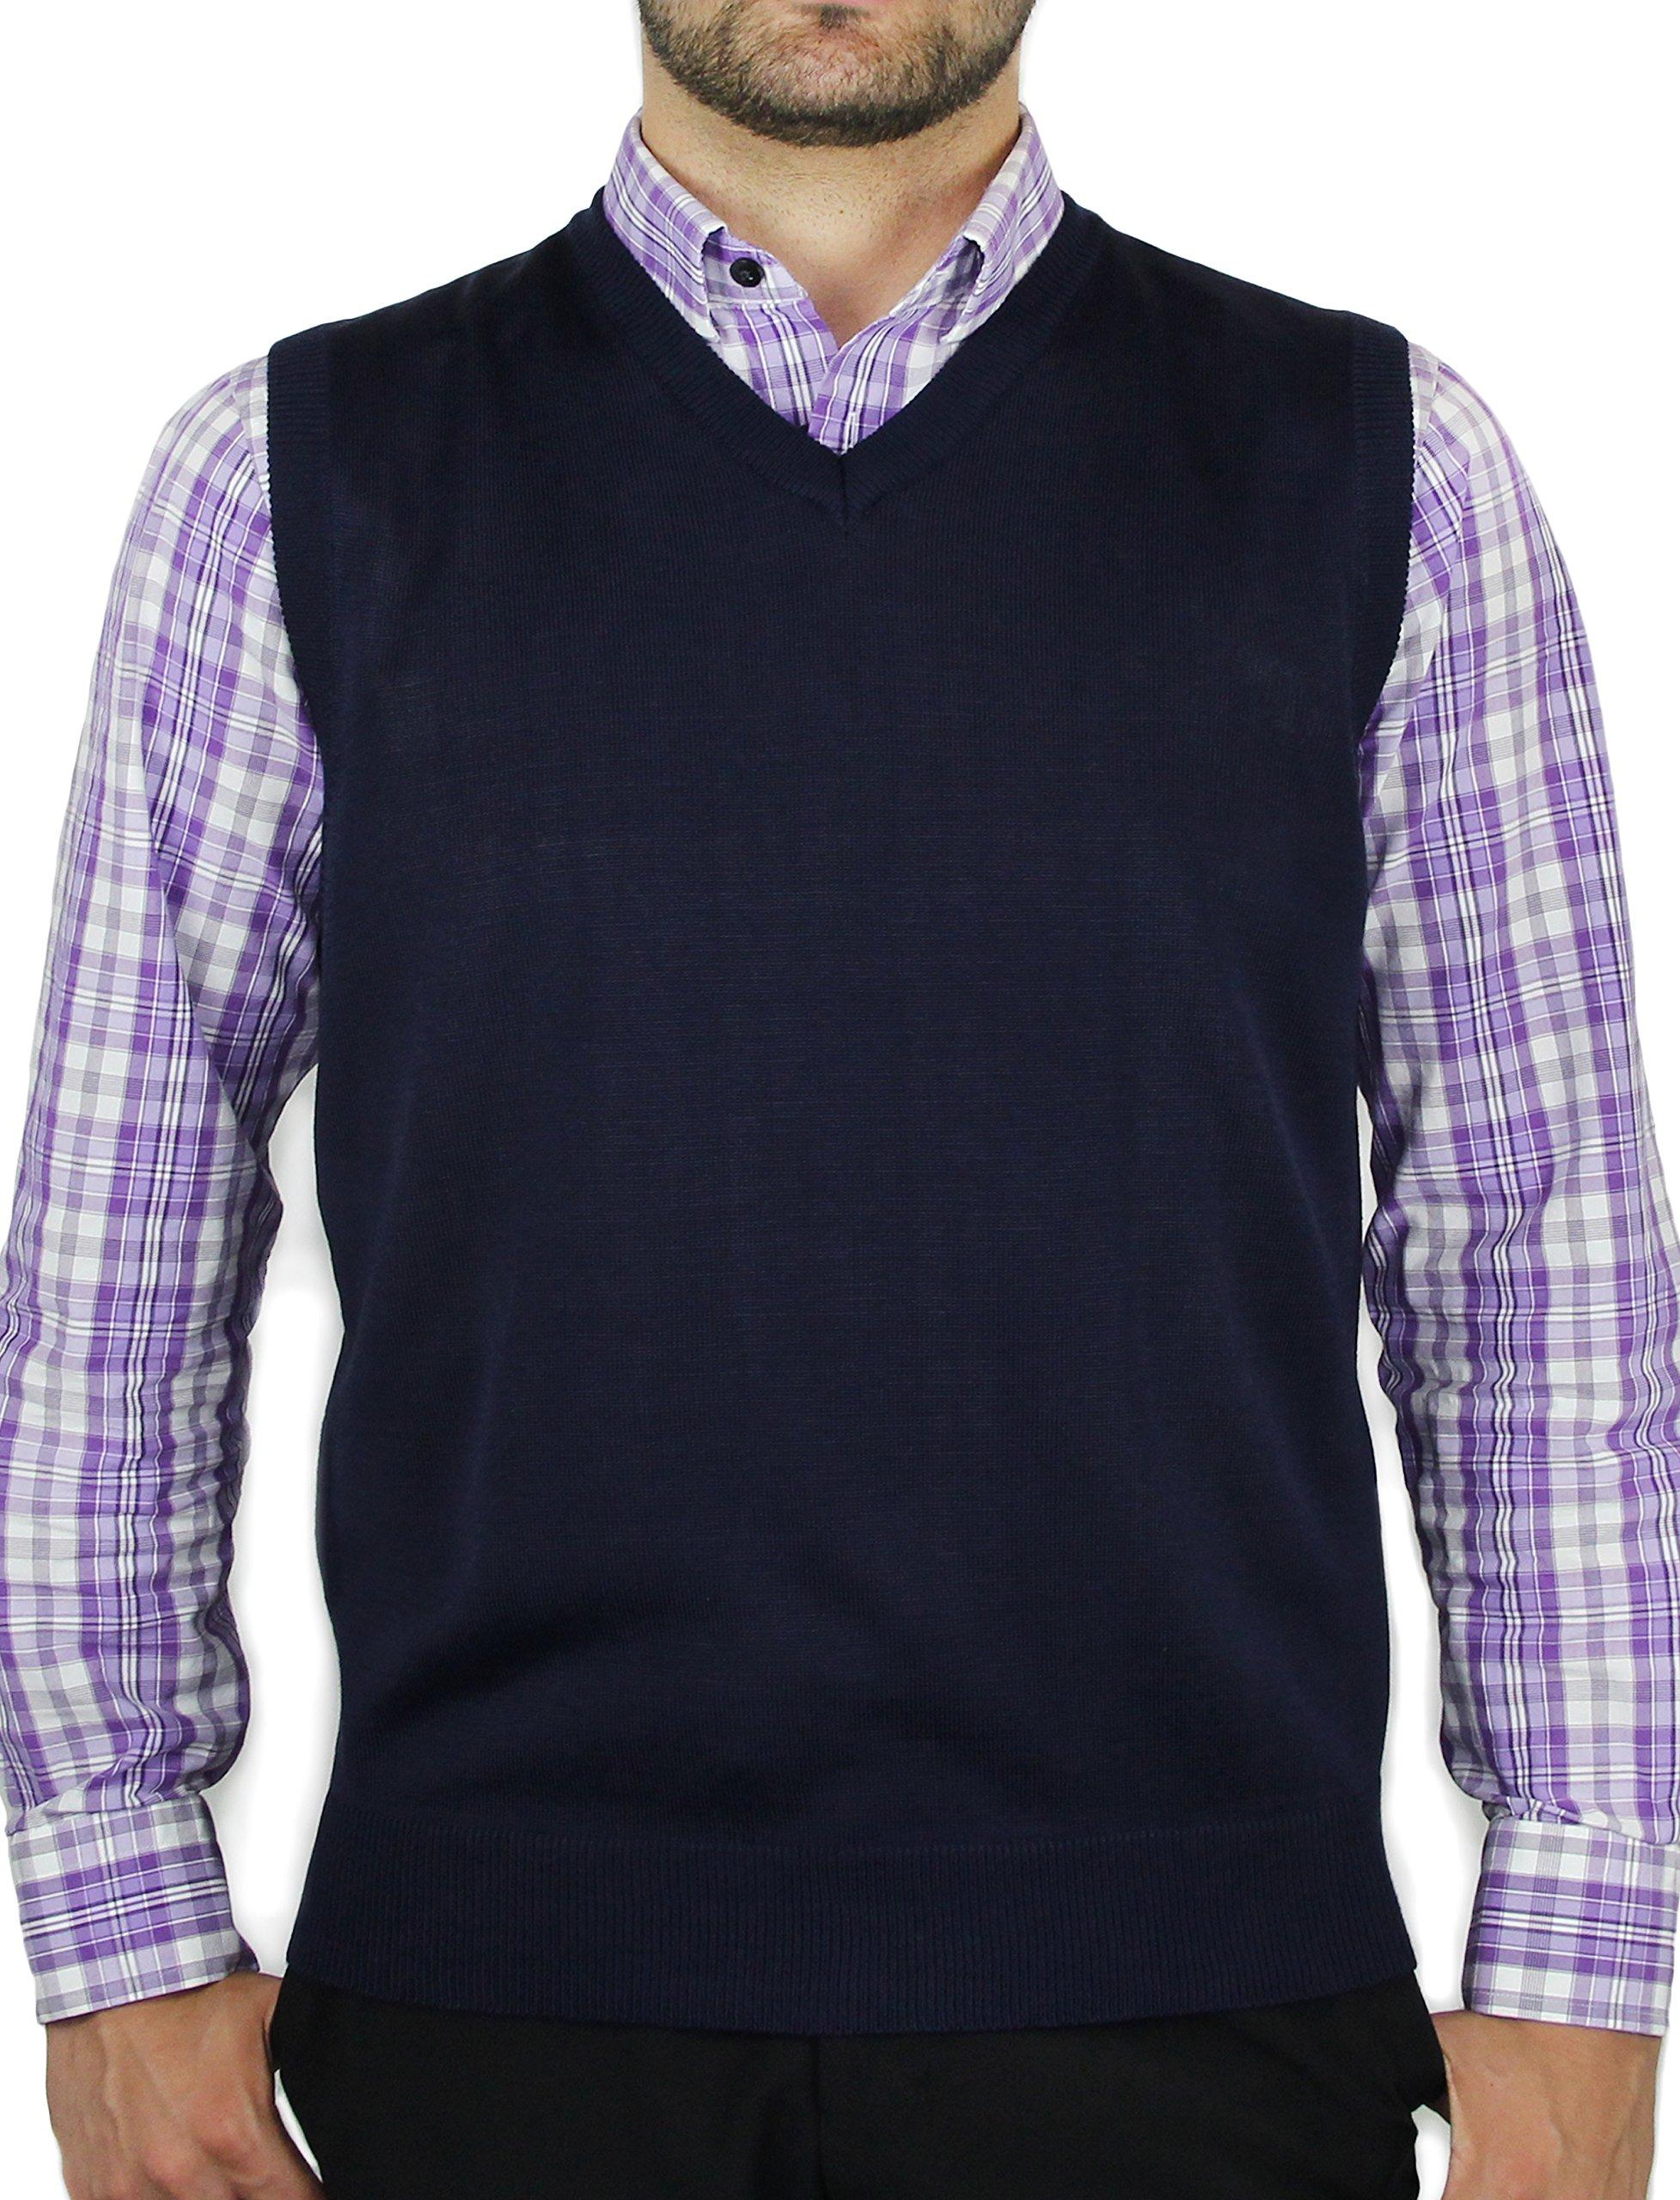 Blue Ocean Solid Color Sweater Vest-3X-Large Navy by Blue Ocean